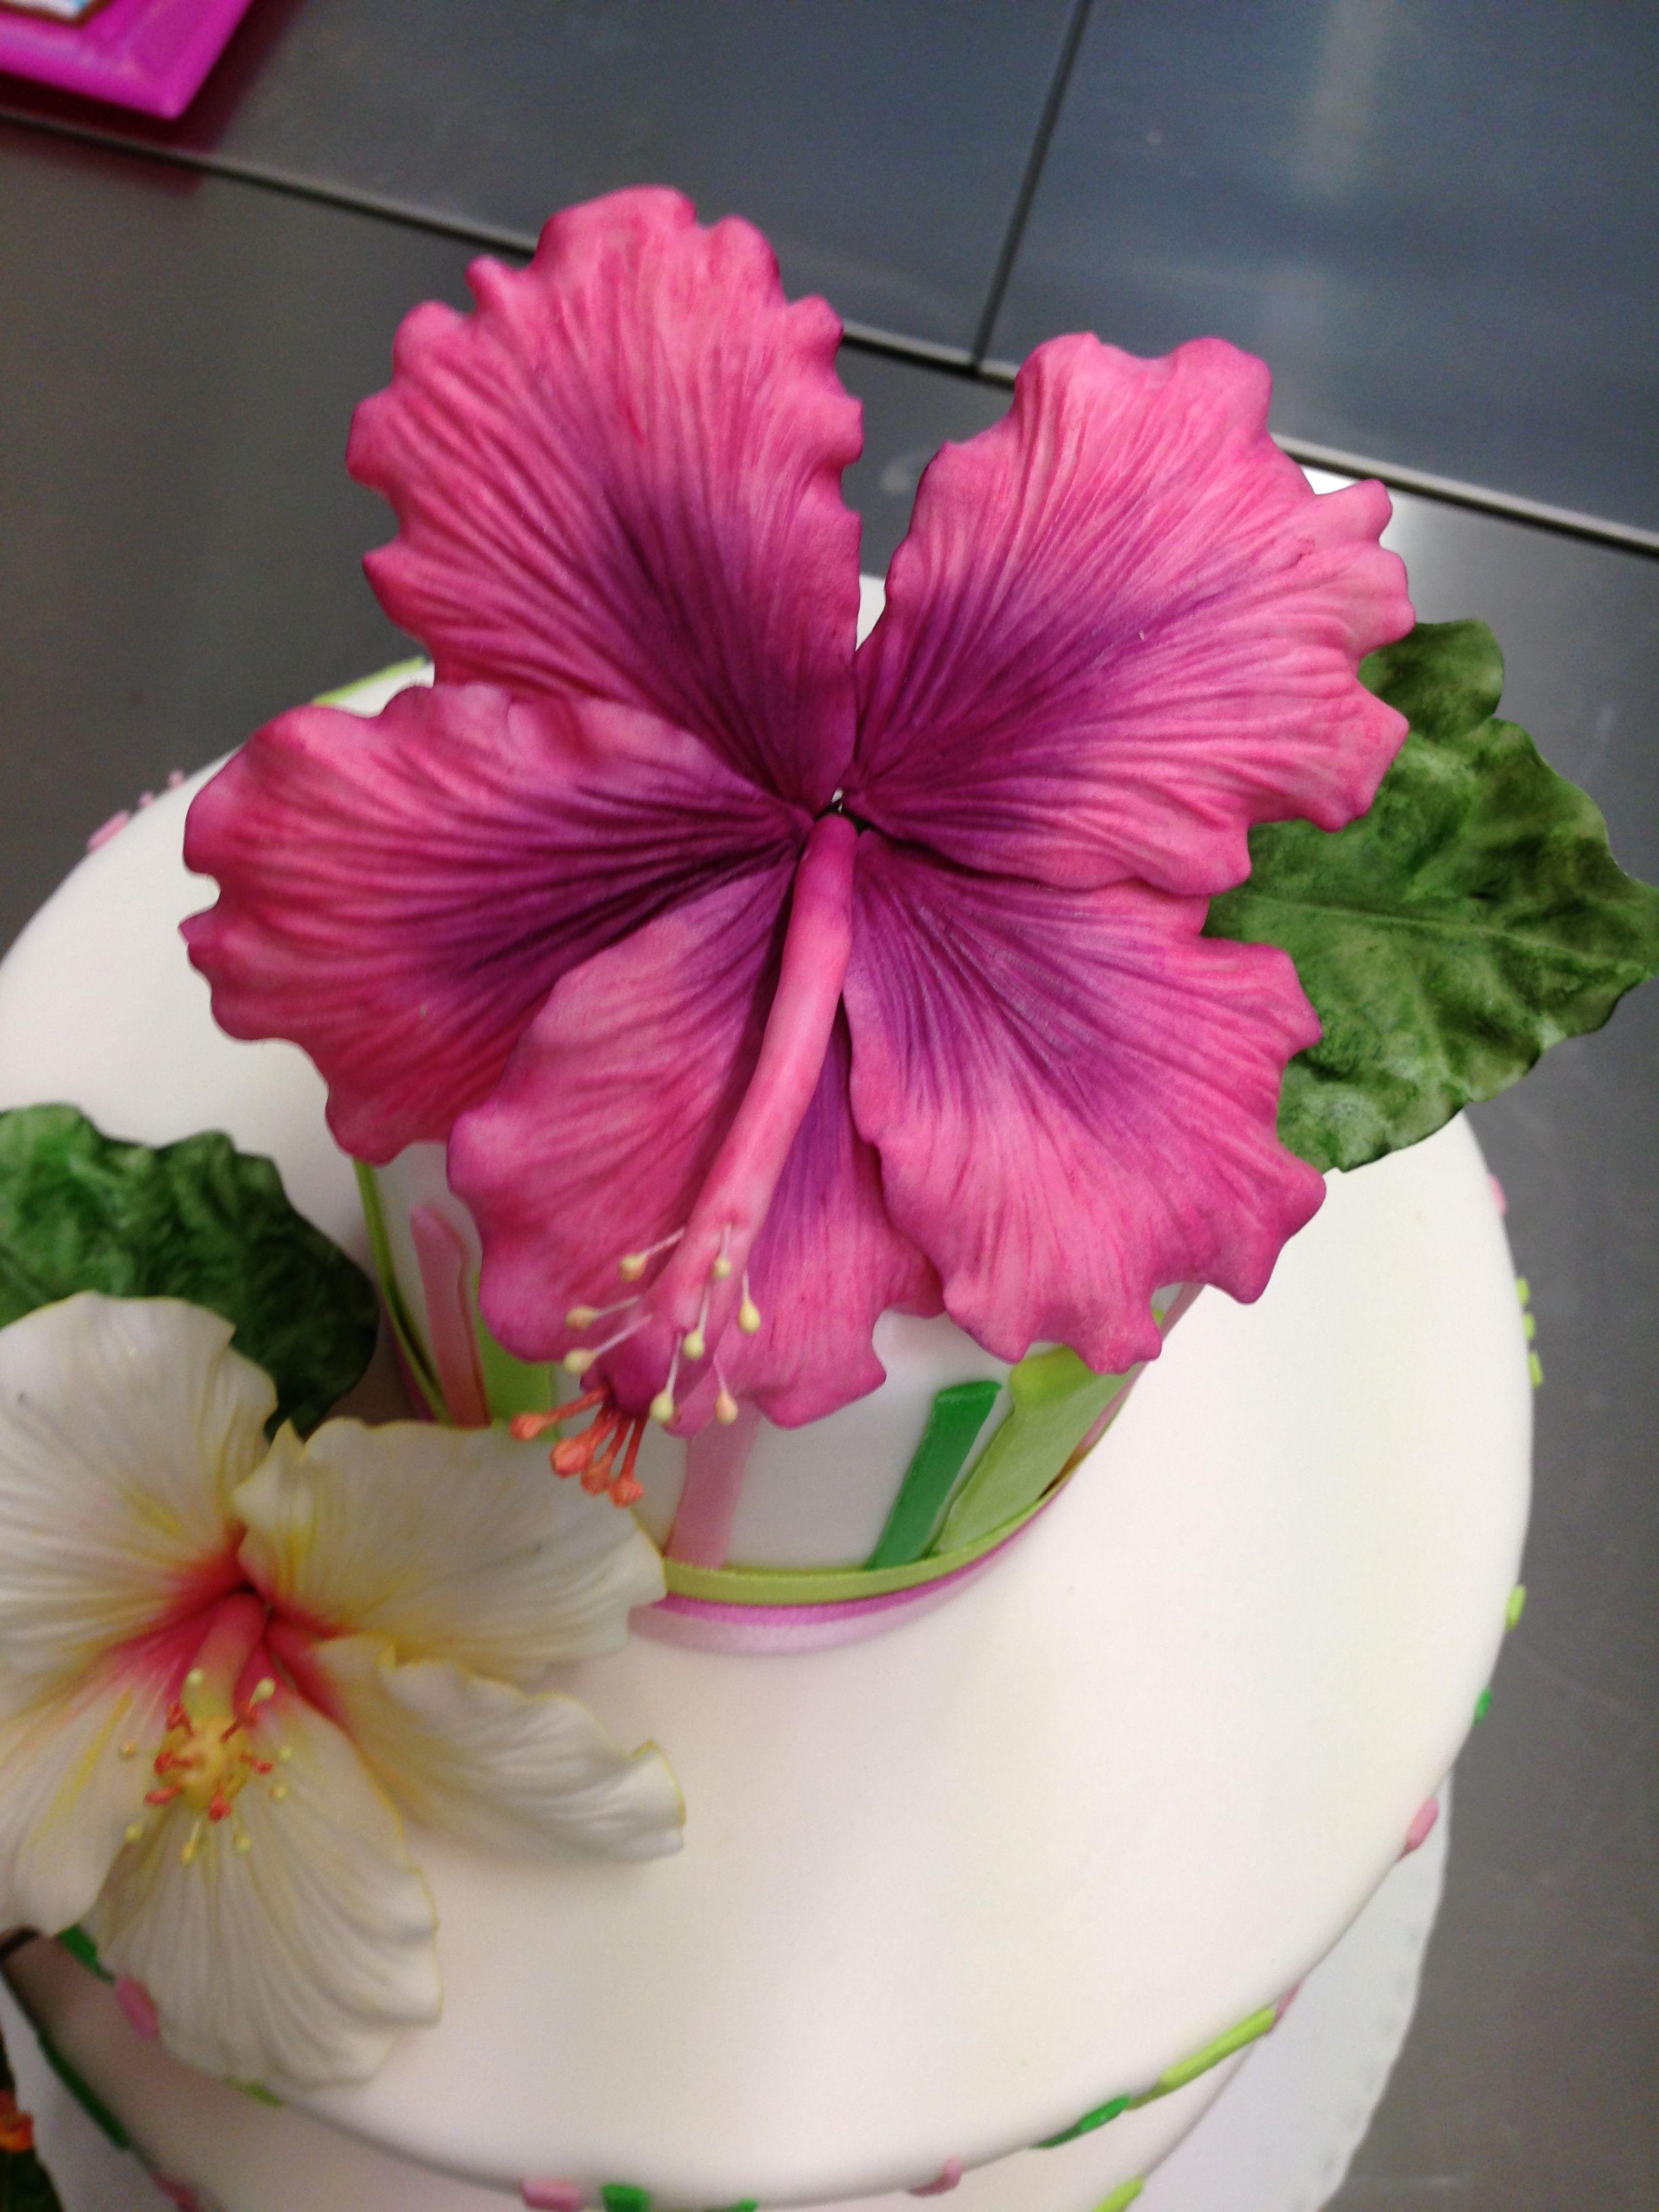 Hibiscus 3y picture tutorial flowers sugar in 2018 pinterest hibiscus 3y picture izmirmasajfo